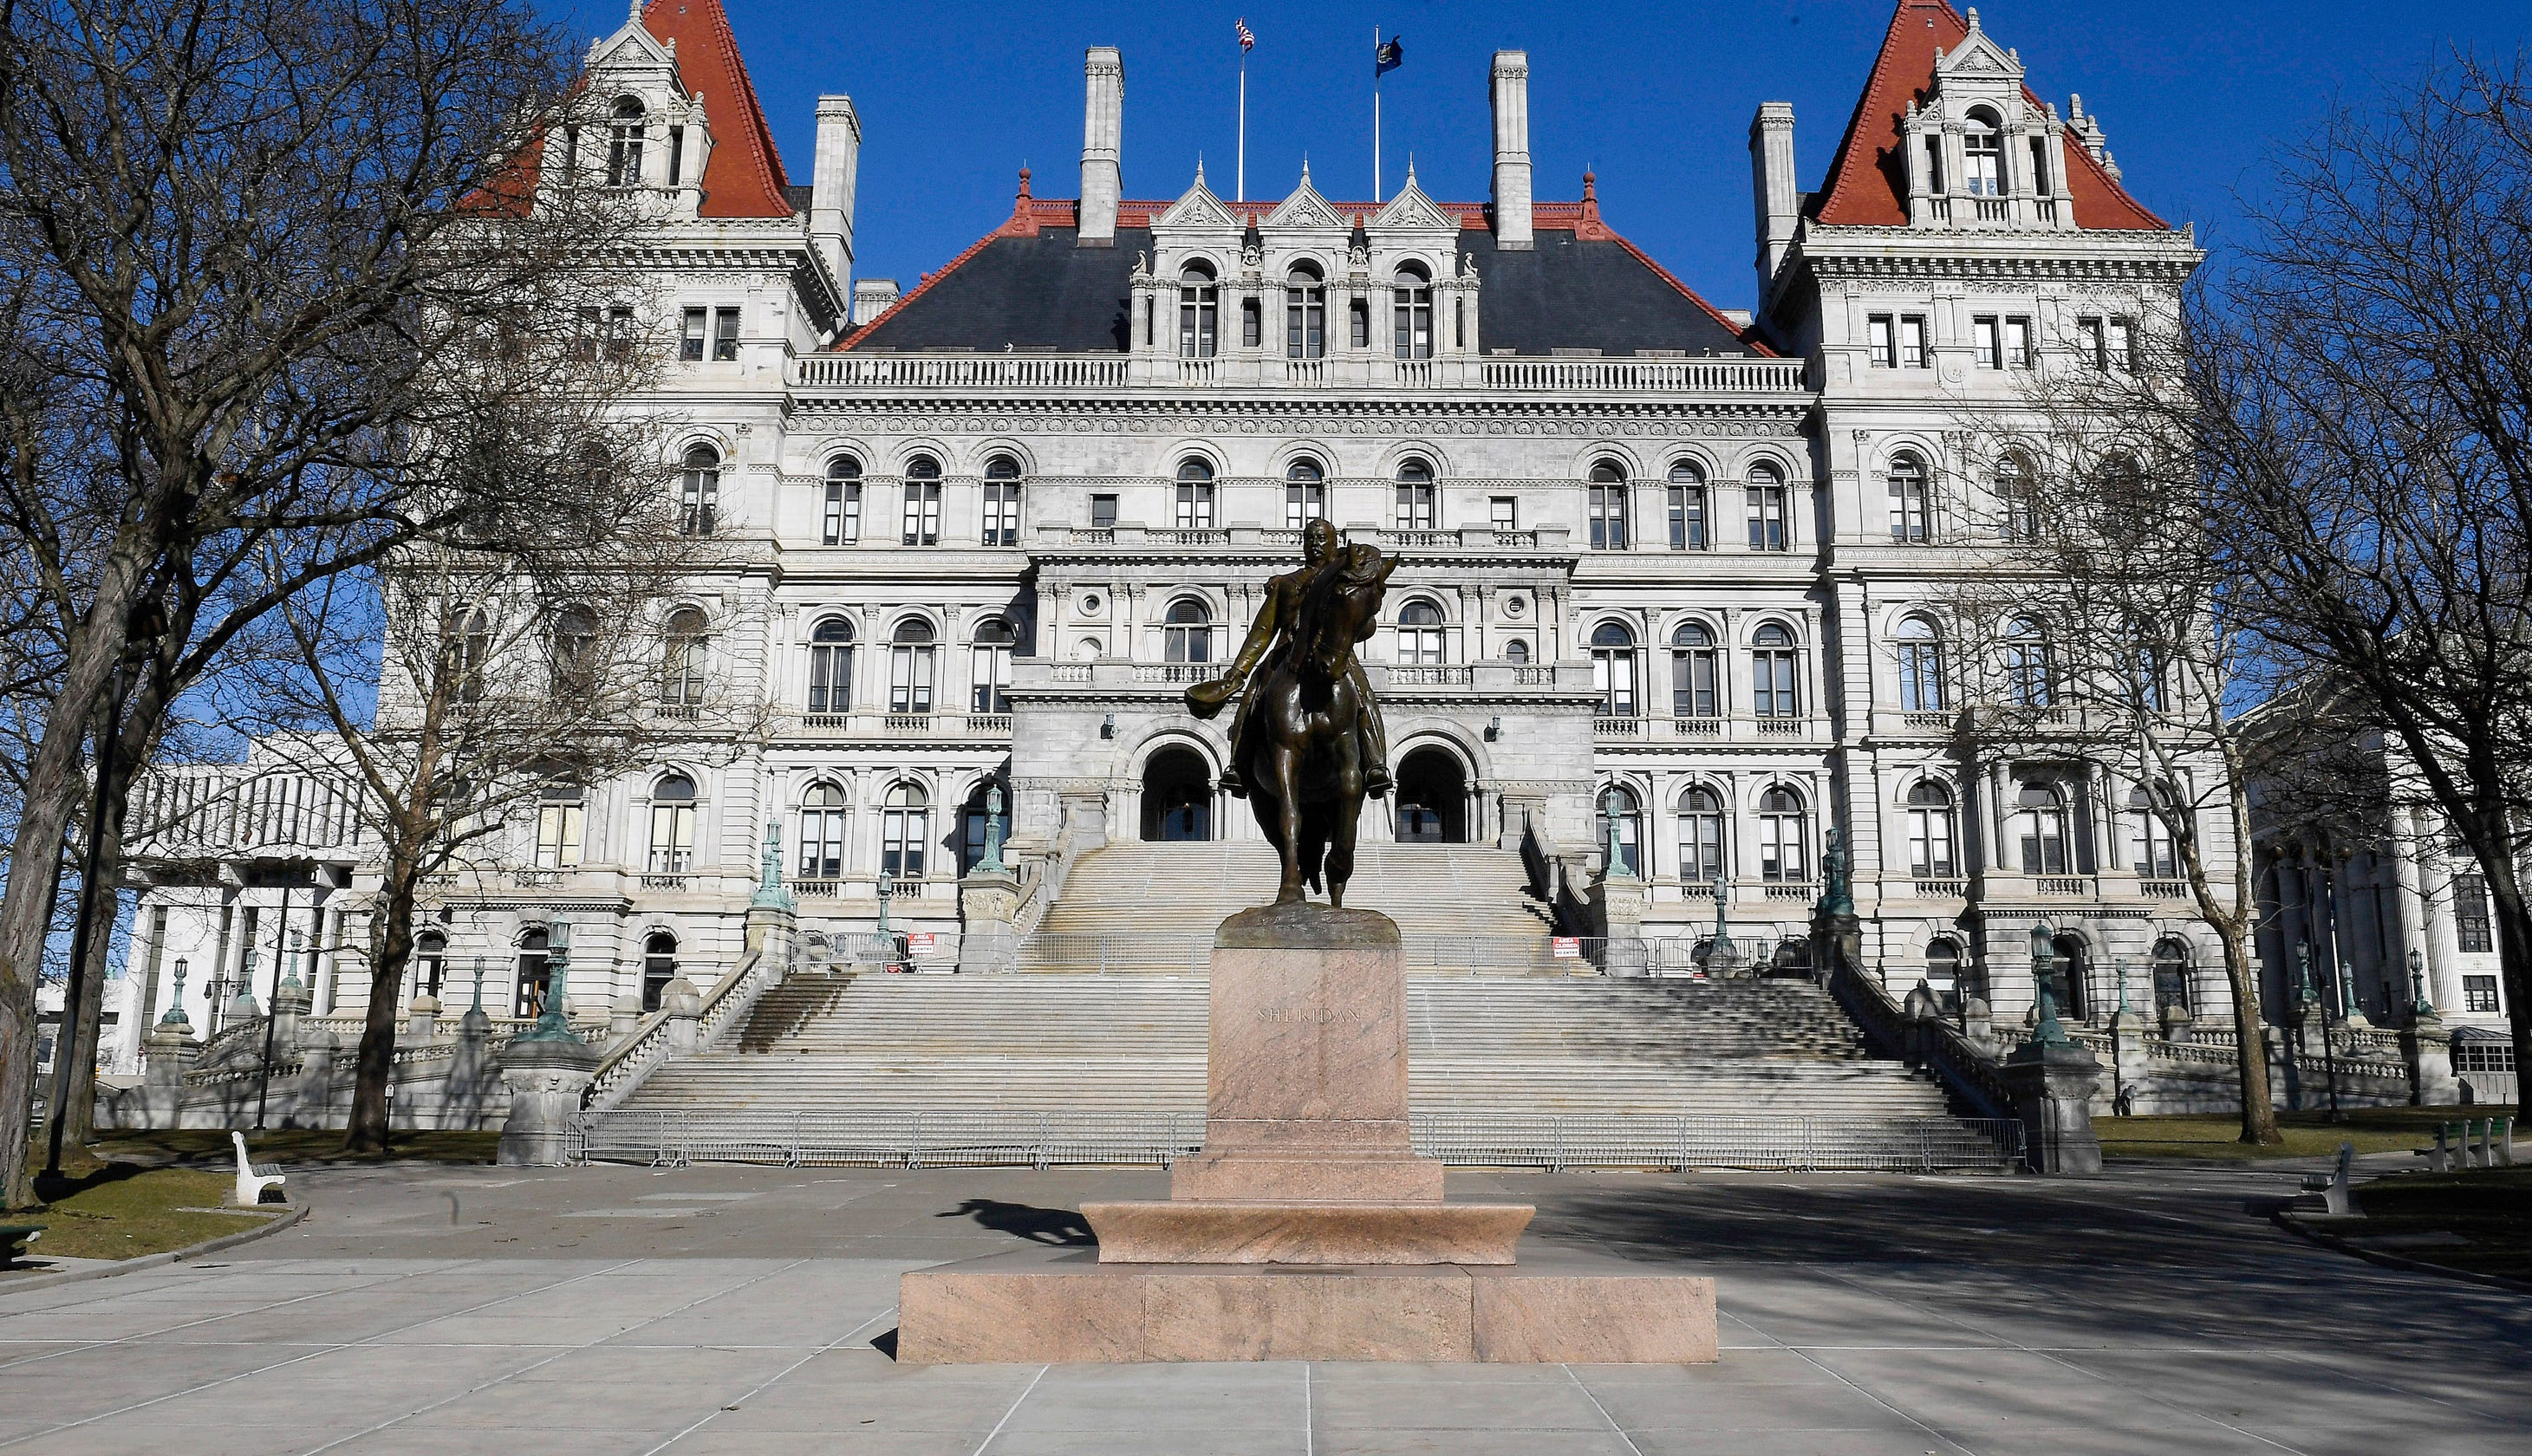 Fact Check: New York legislators did not just vote a pay raise during the coronavirus shutdown